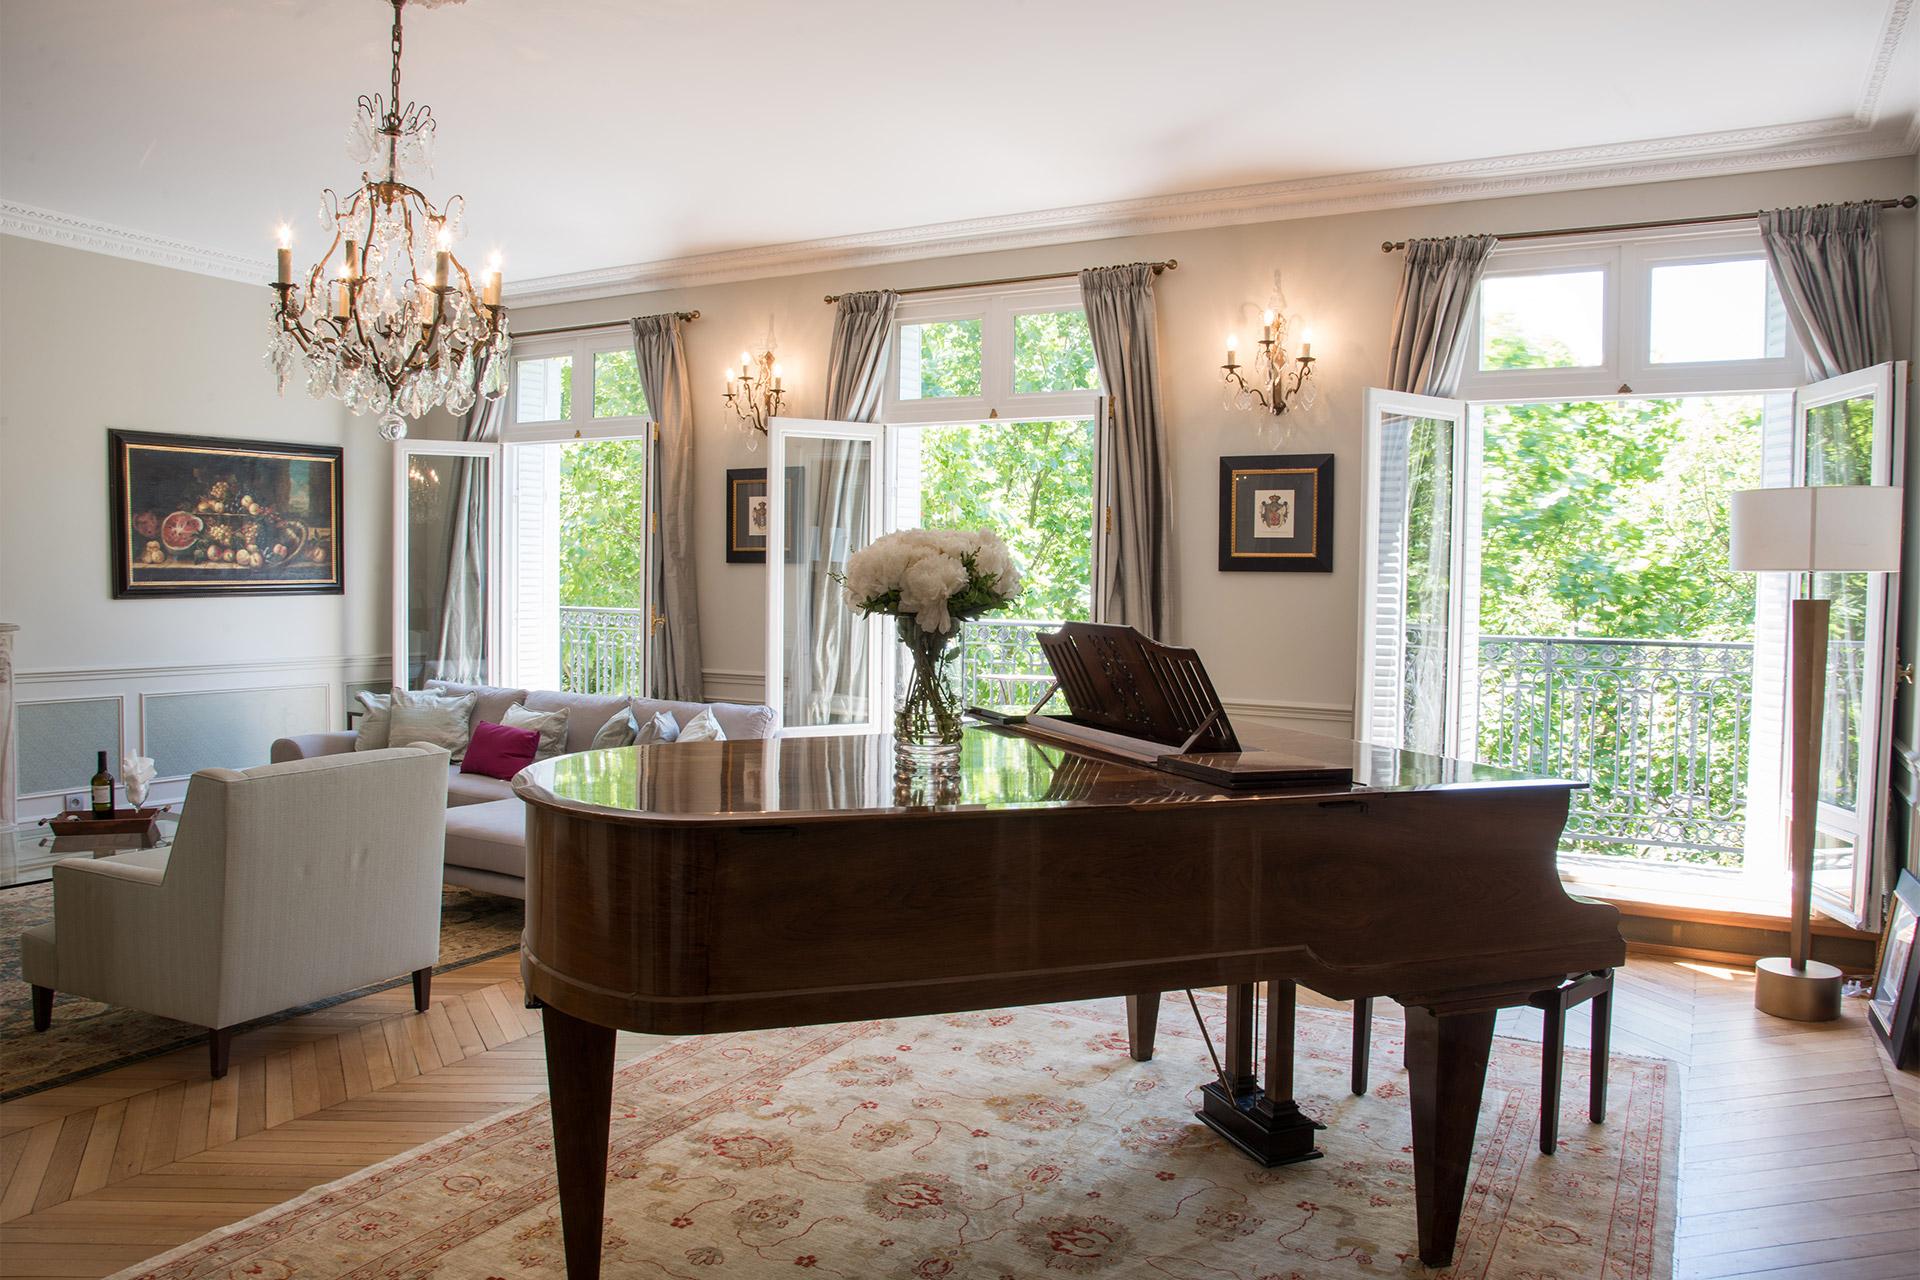 Piano in Luxury Paris Vacation Rental